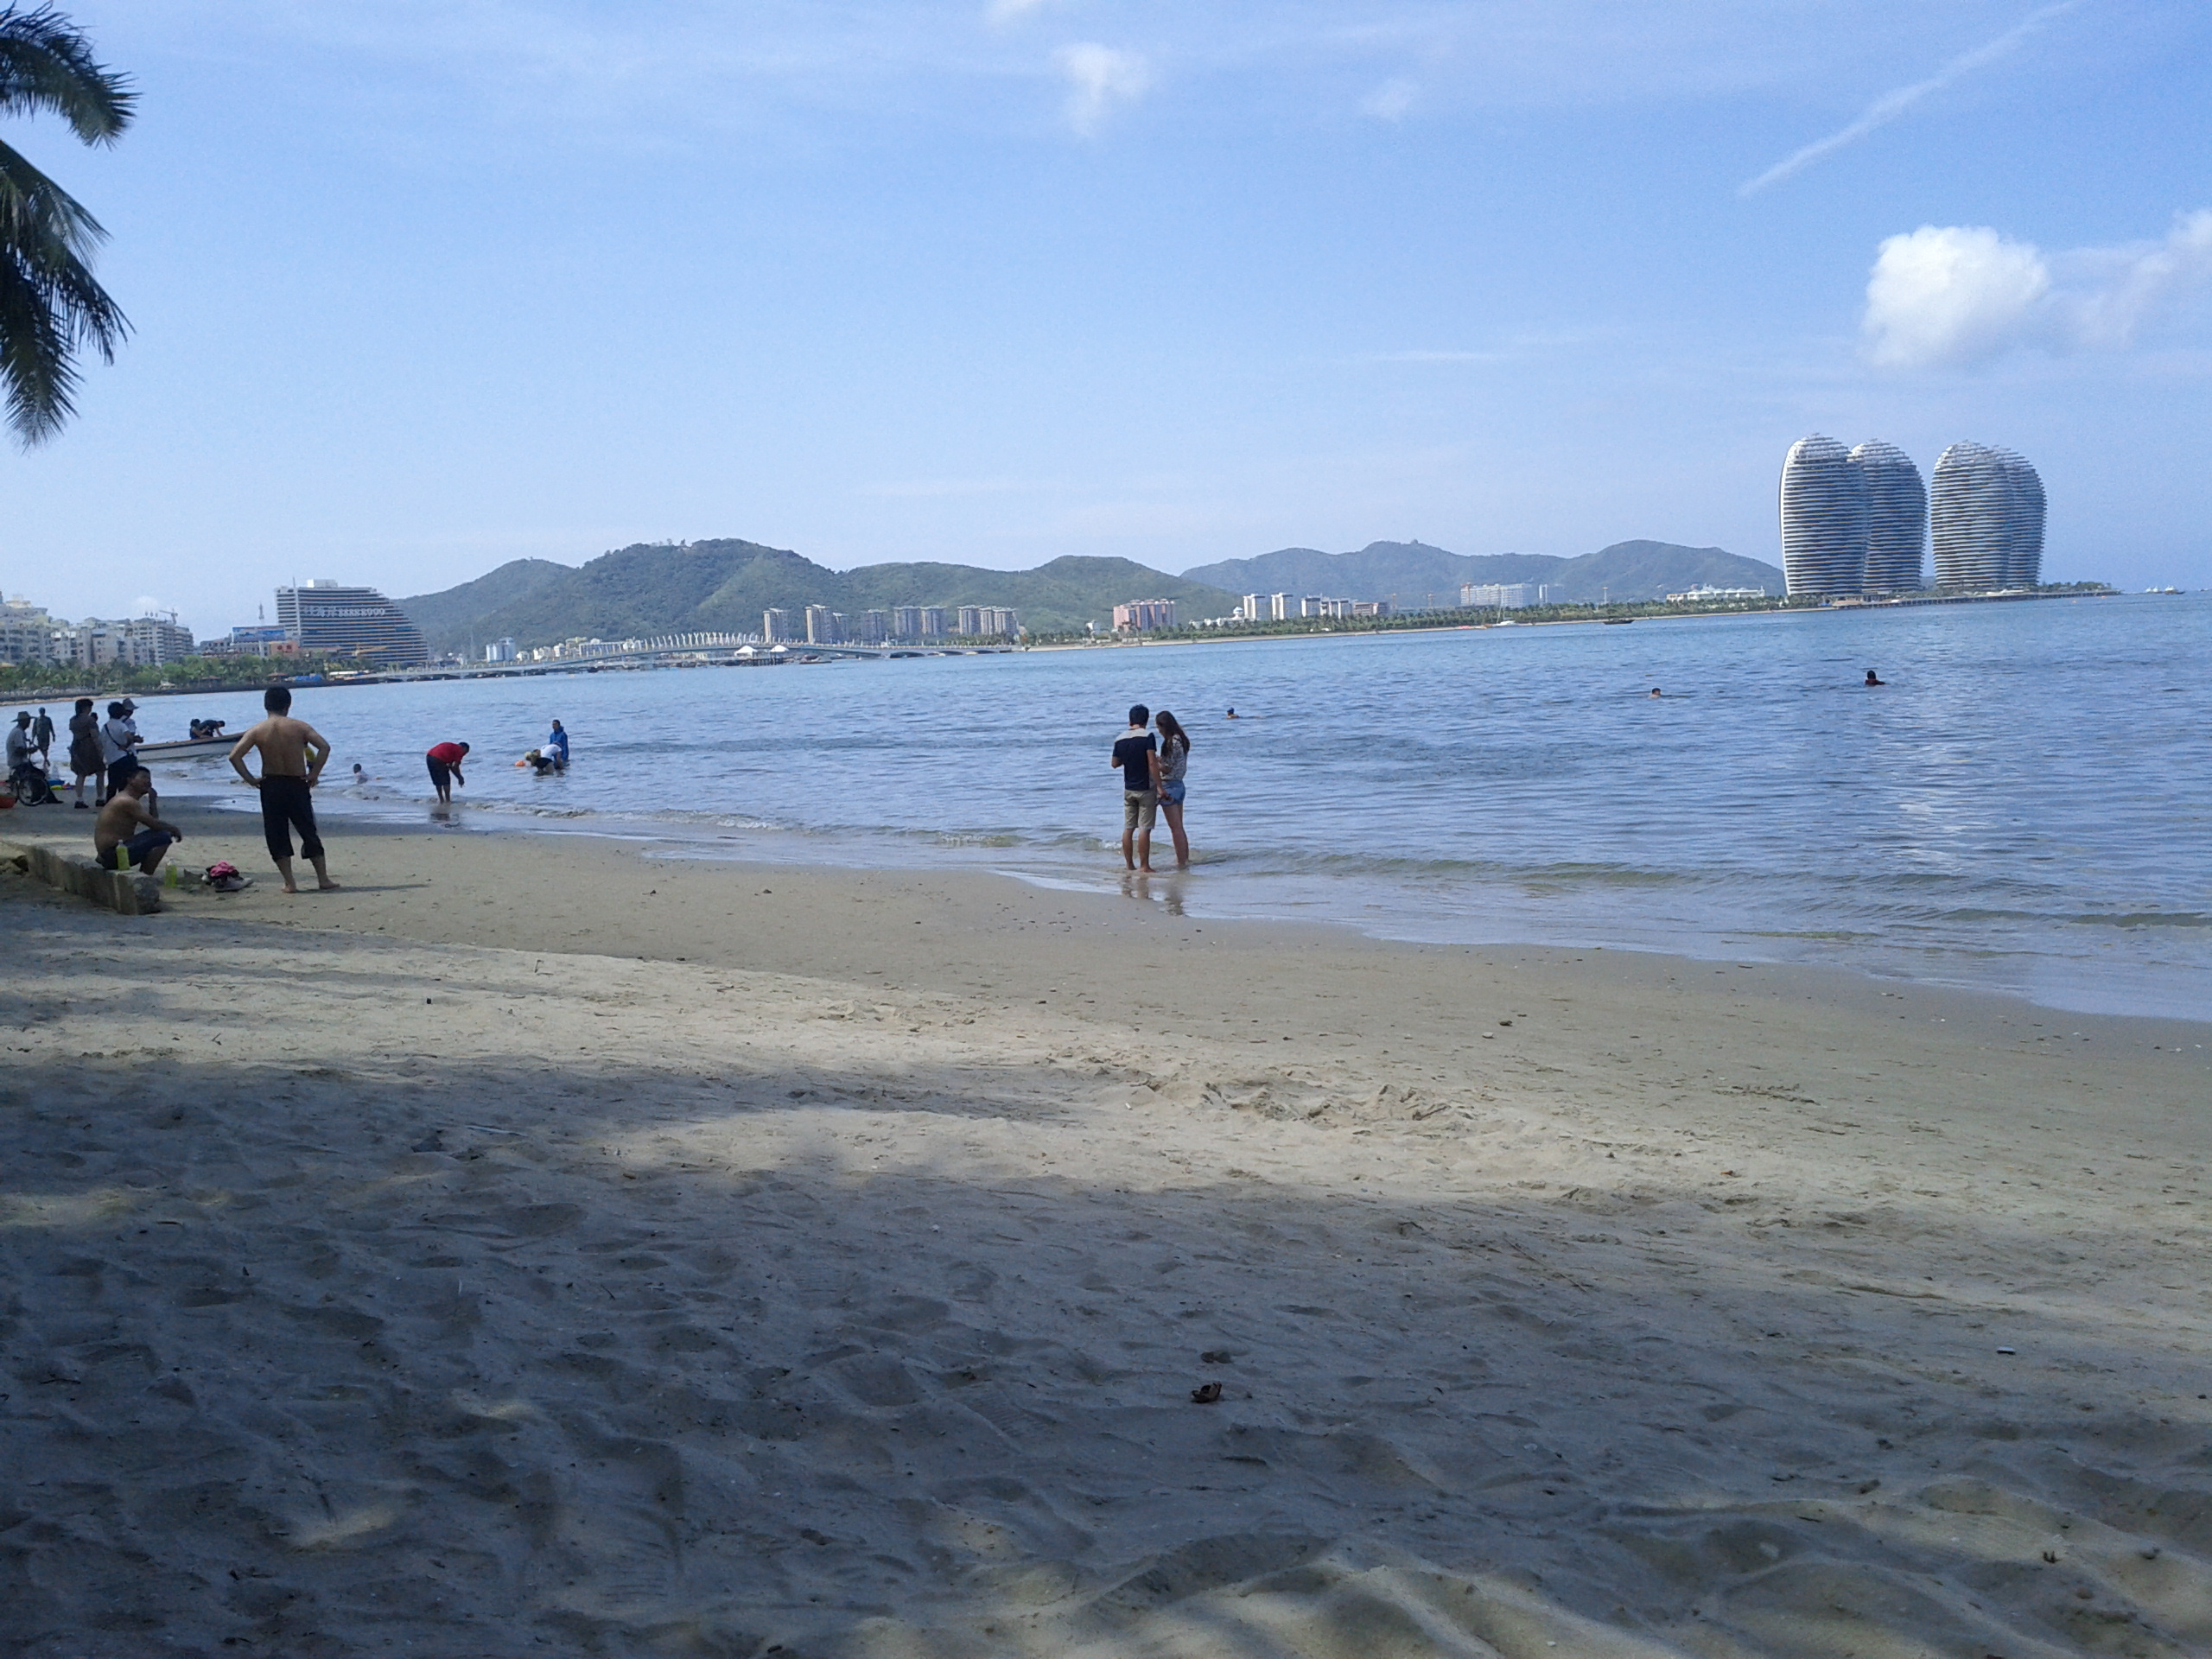 File:Beaches in Sanya, Hainan, China12.jpg - Wikimedia Commons